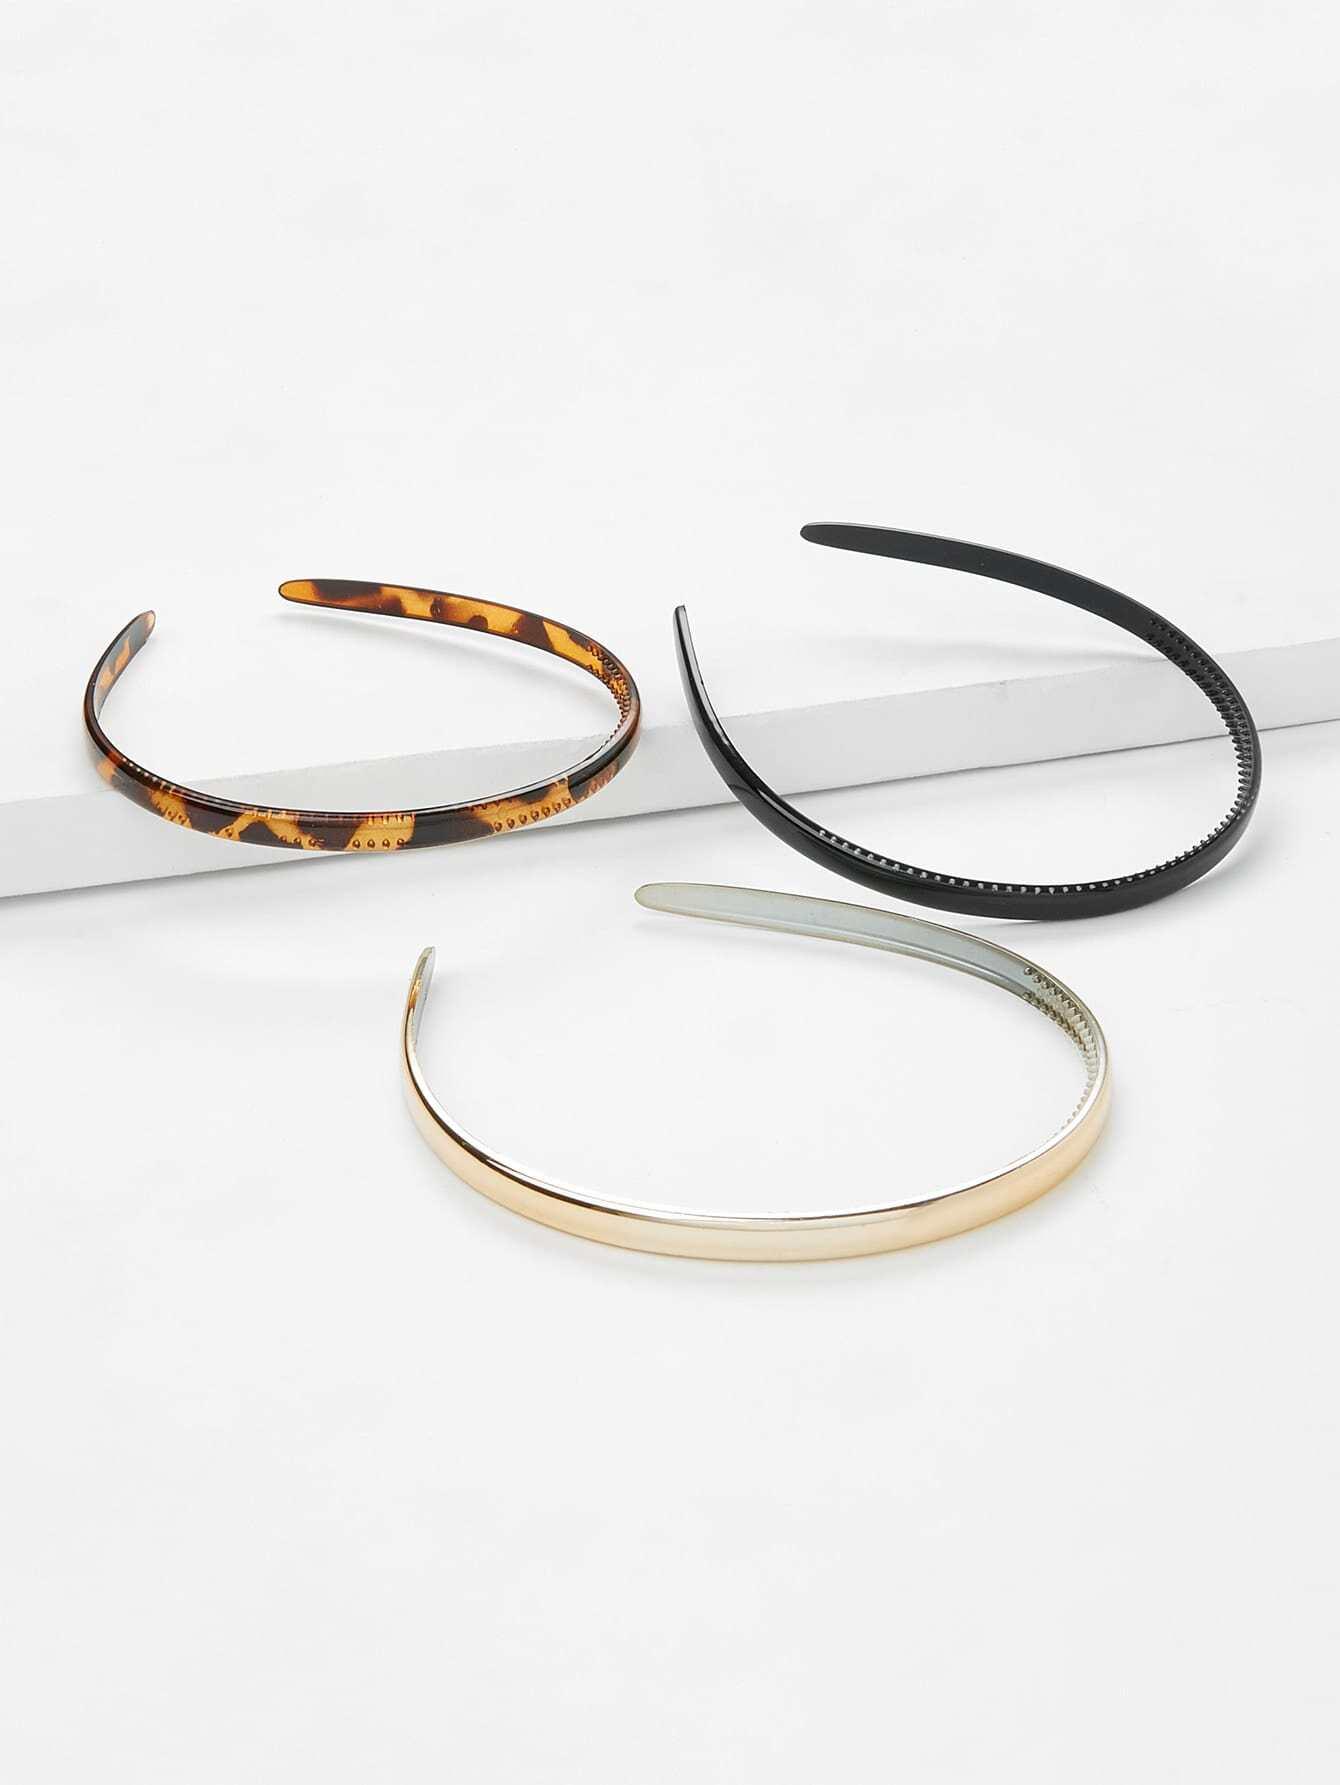 Leopard & Plain Design Headband 3Pcs plain headband 3pcs